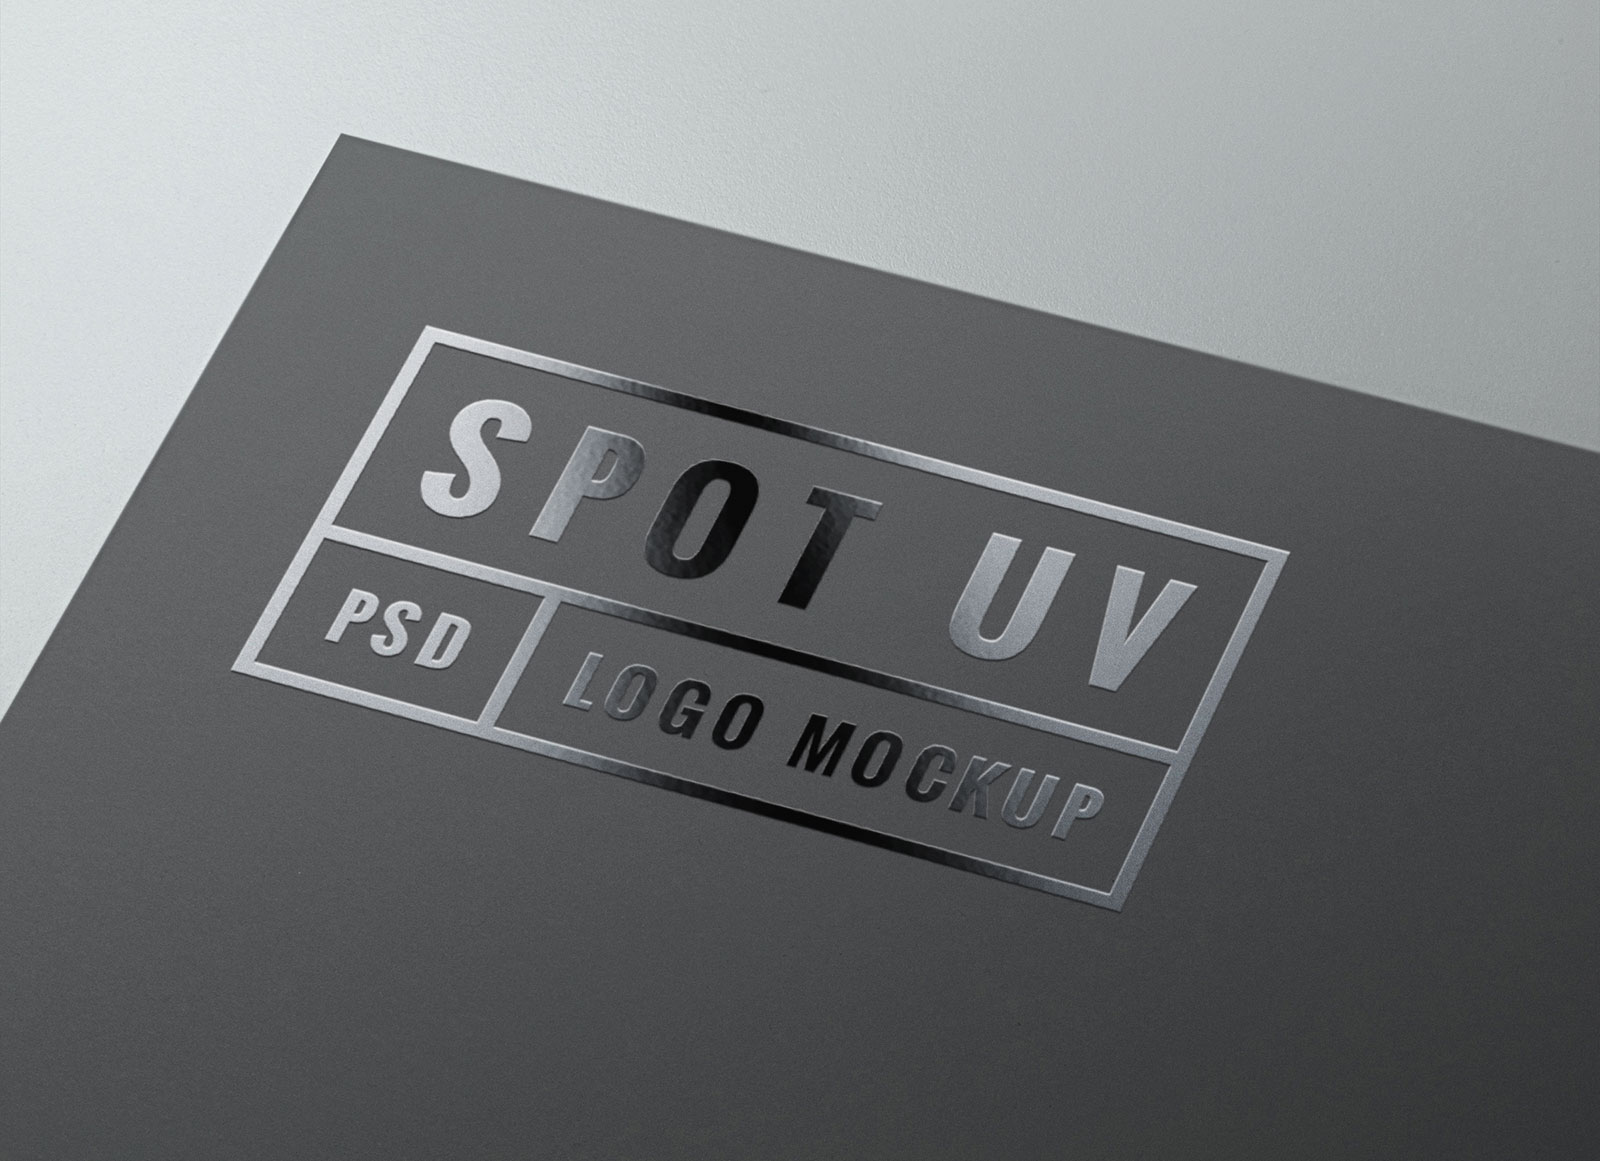 Free Spot UV Coating Logo Mockup PSD - Good Mockups